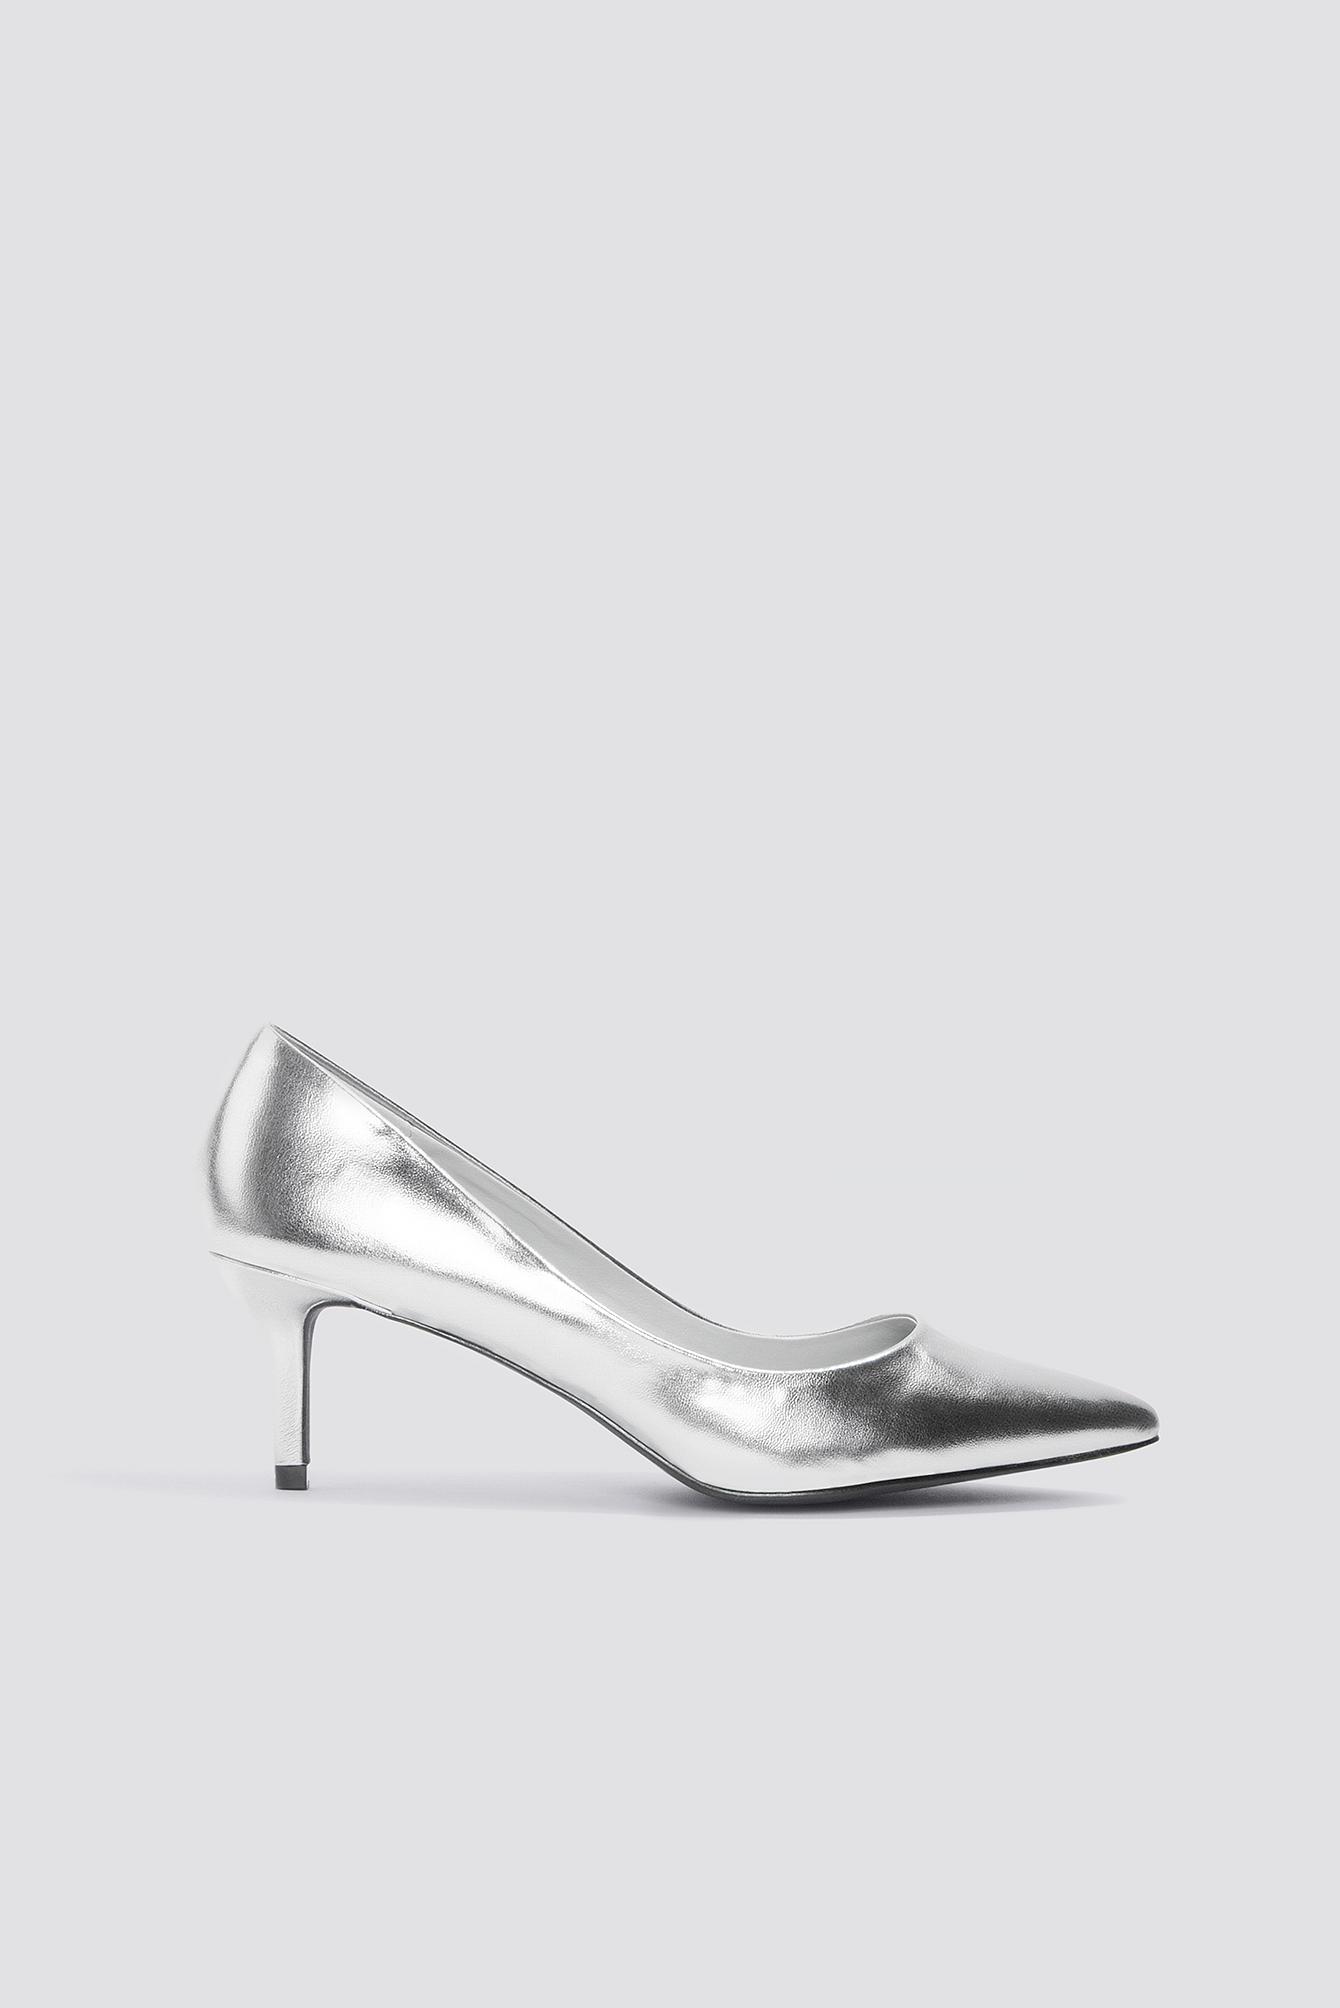 na-kd shoes -  Metallic Mid Heel Pumps - Silver